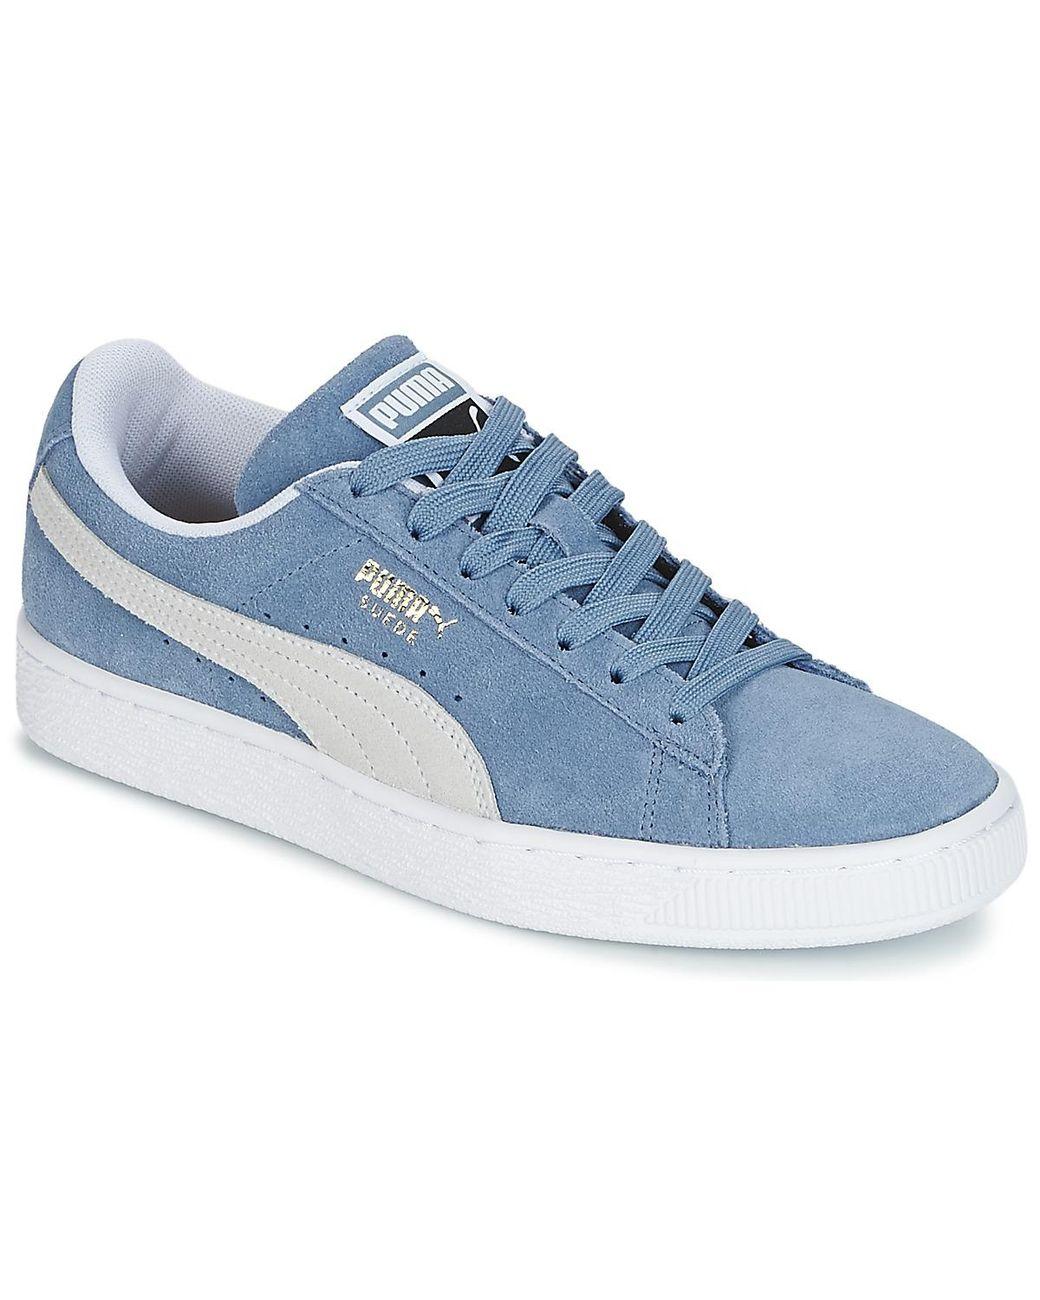 chaussure puma suede femme bleu